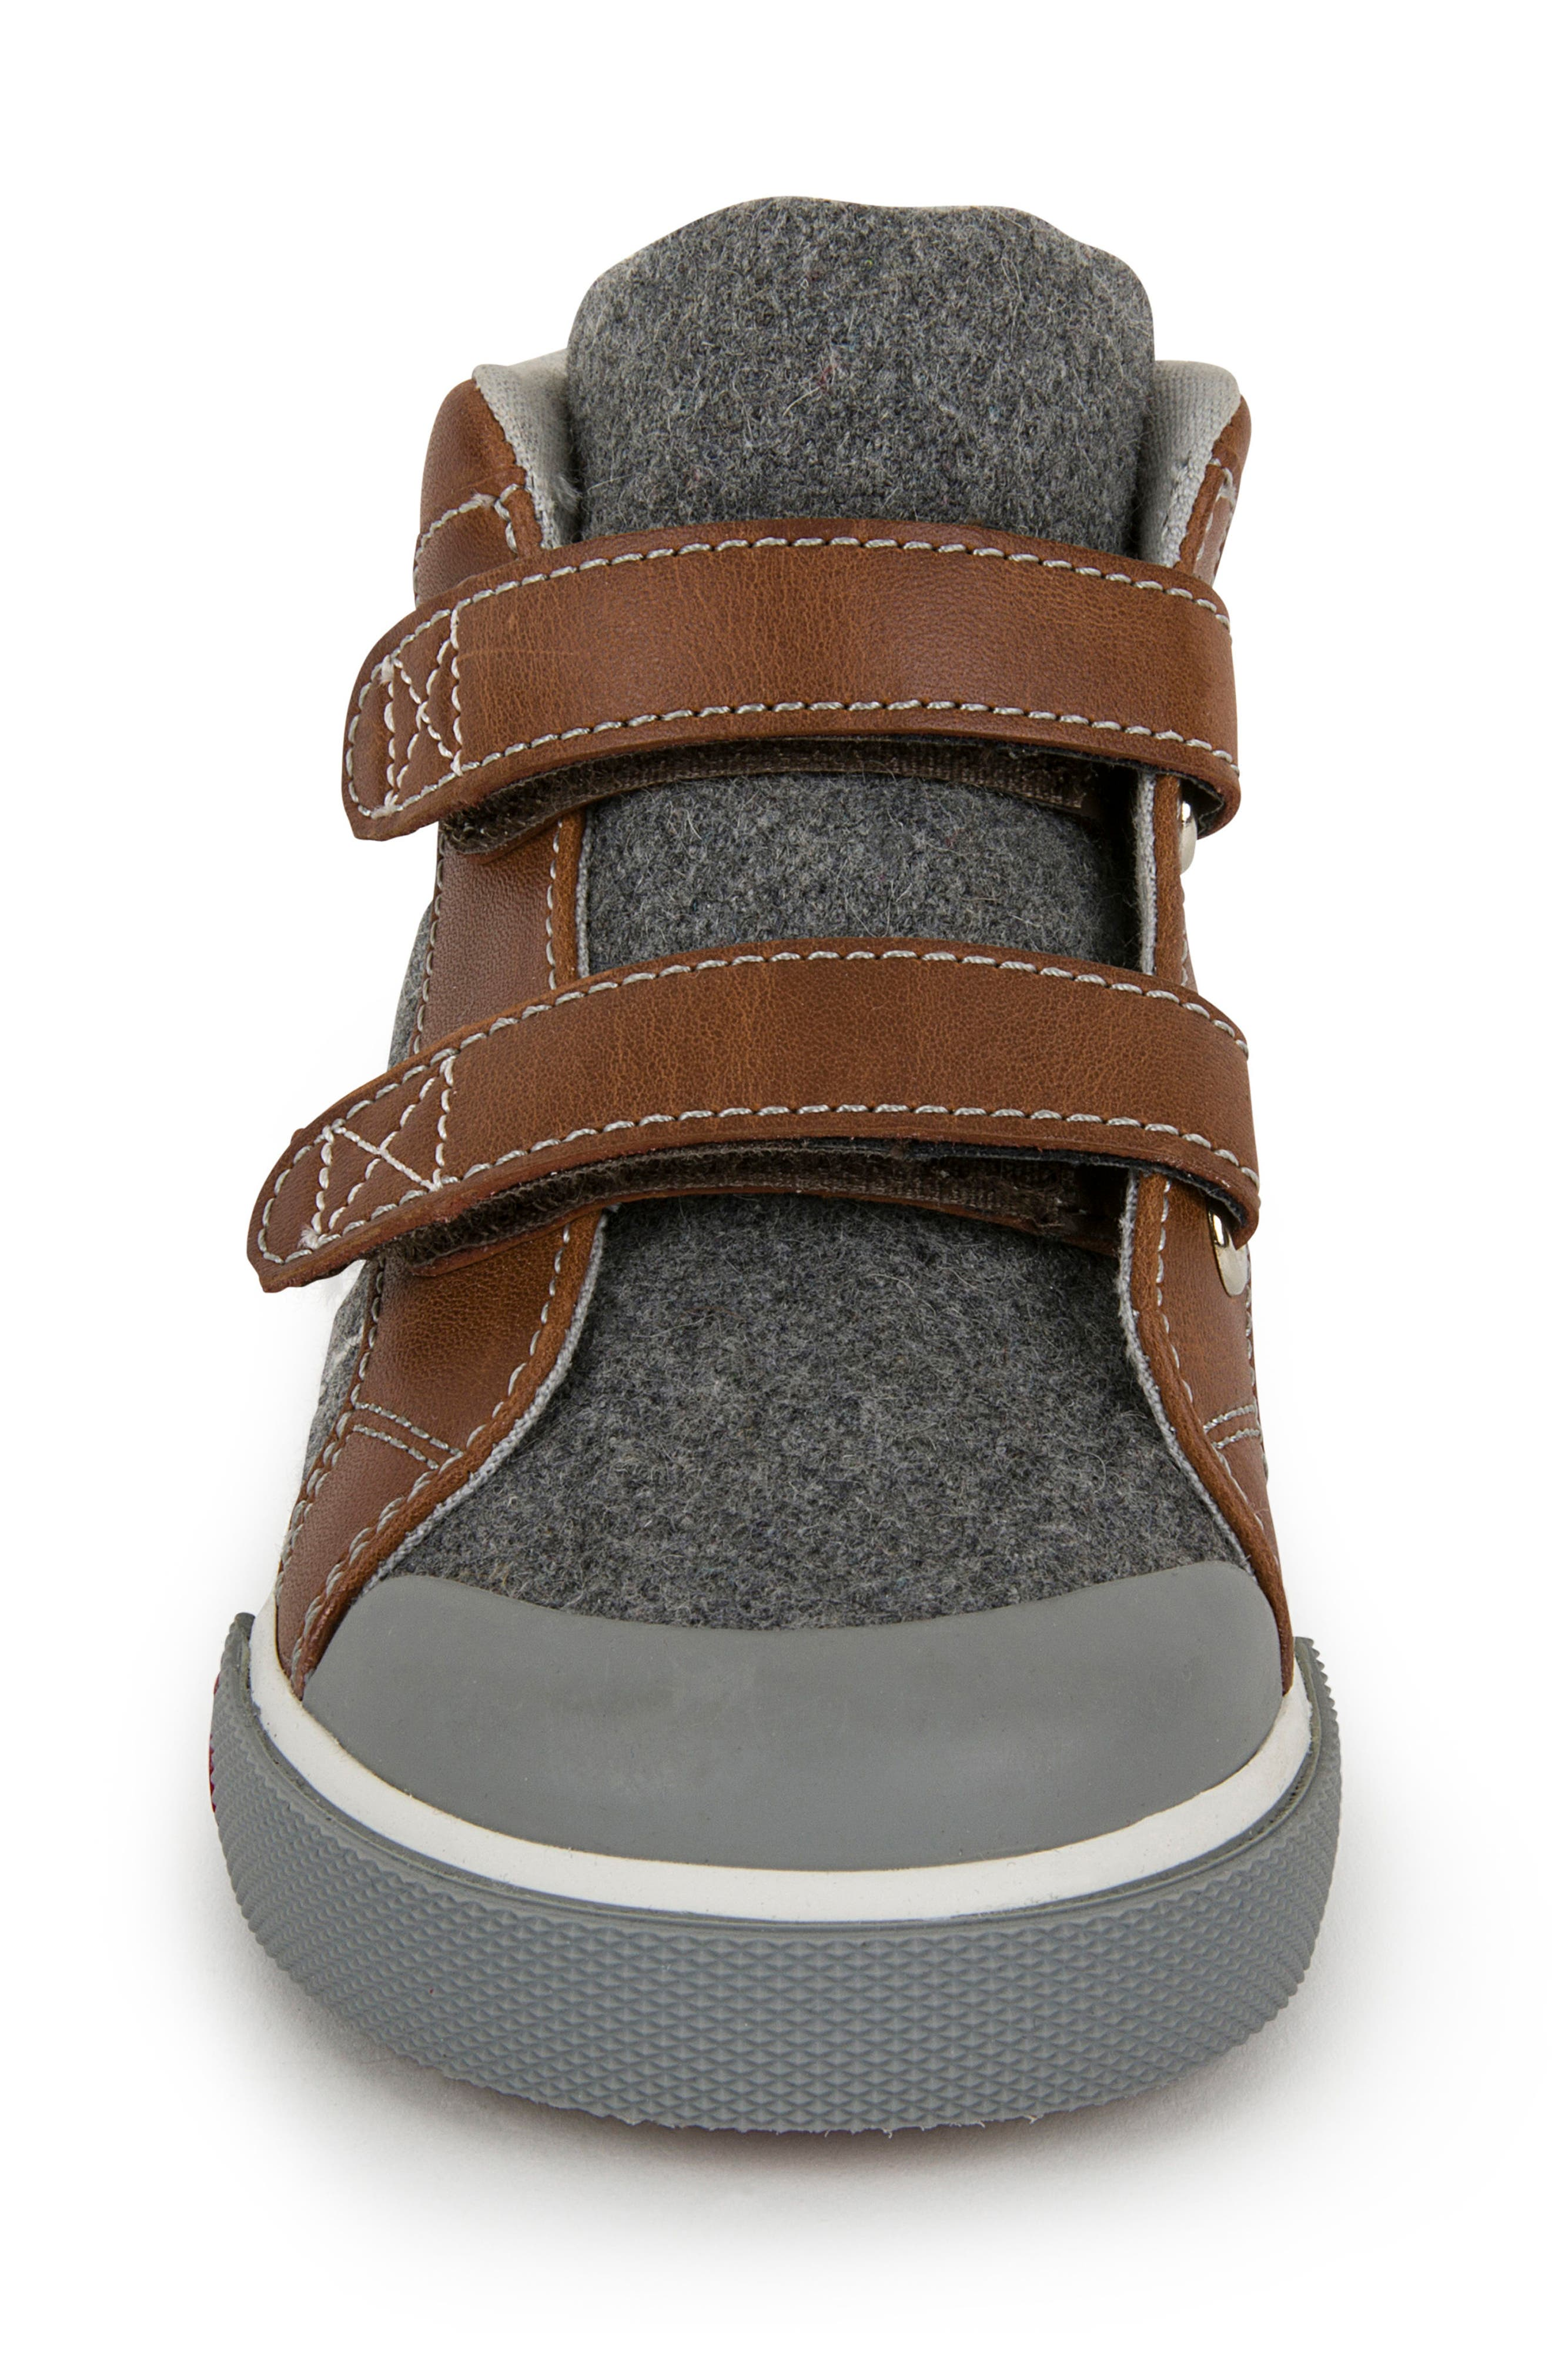 Matty Sneaker,                             Alternate thumbnail 6, color,                             Gray Felt